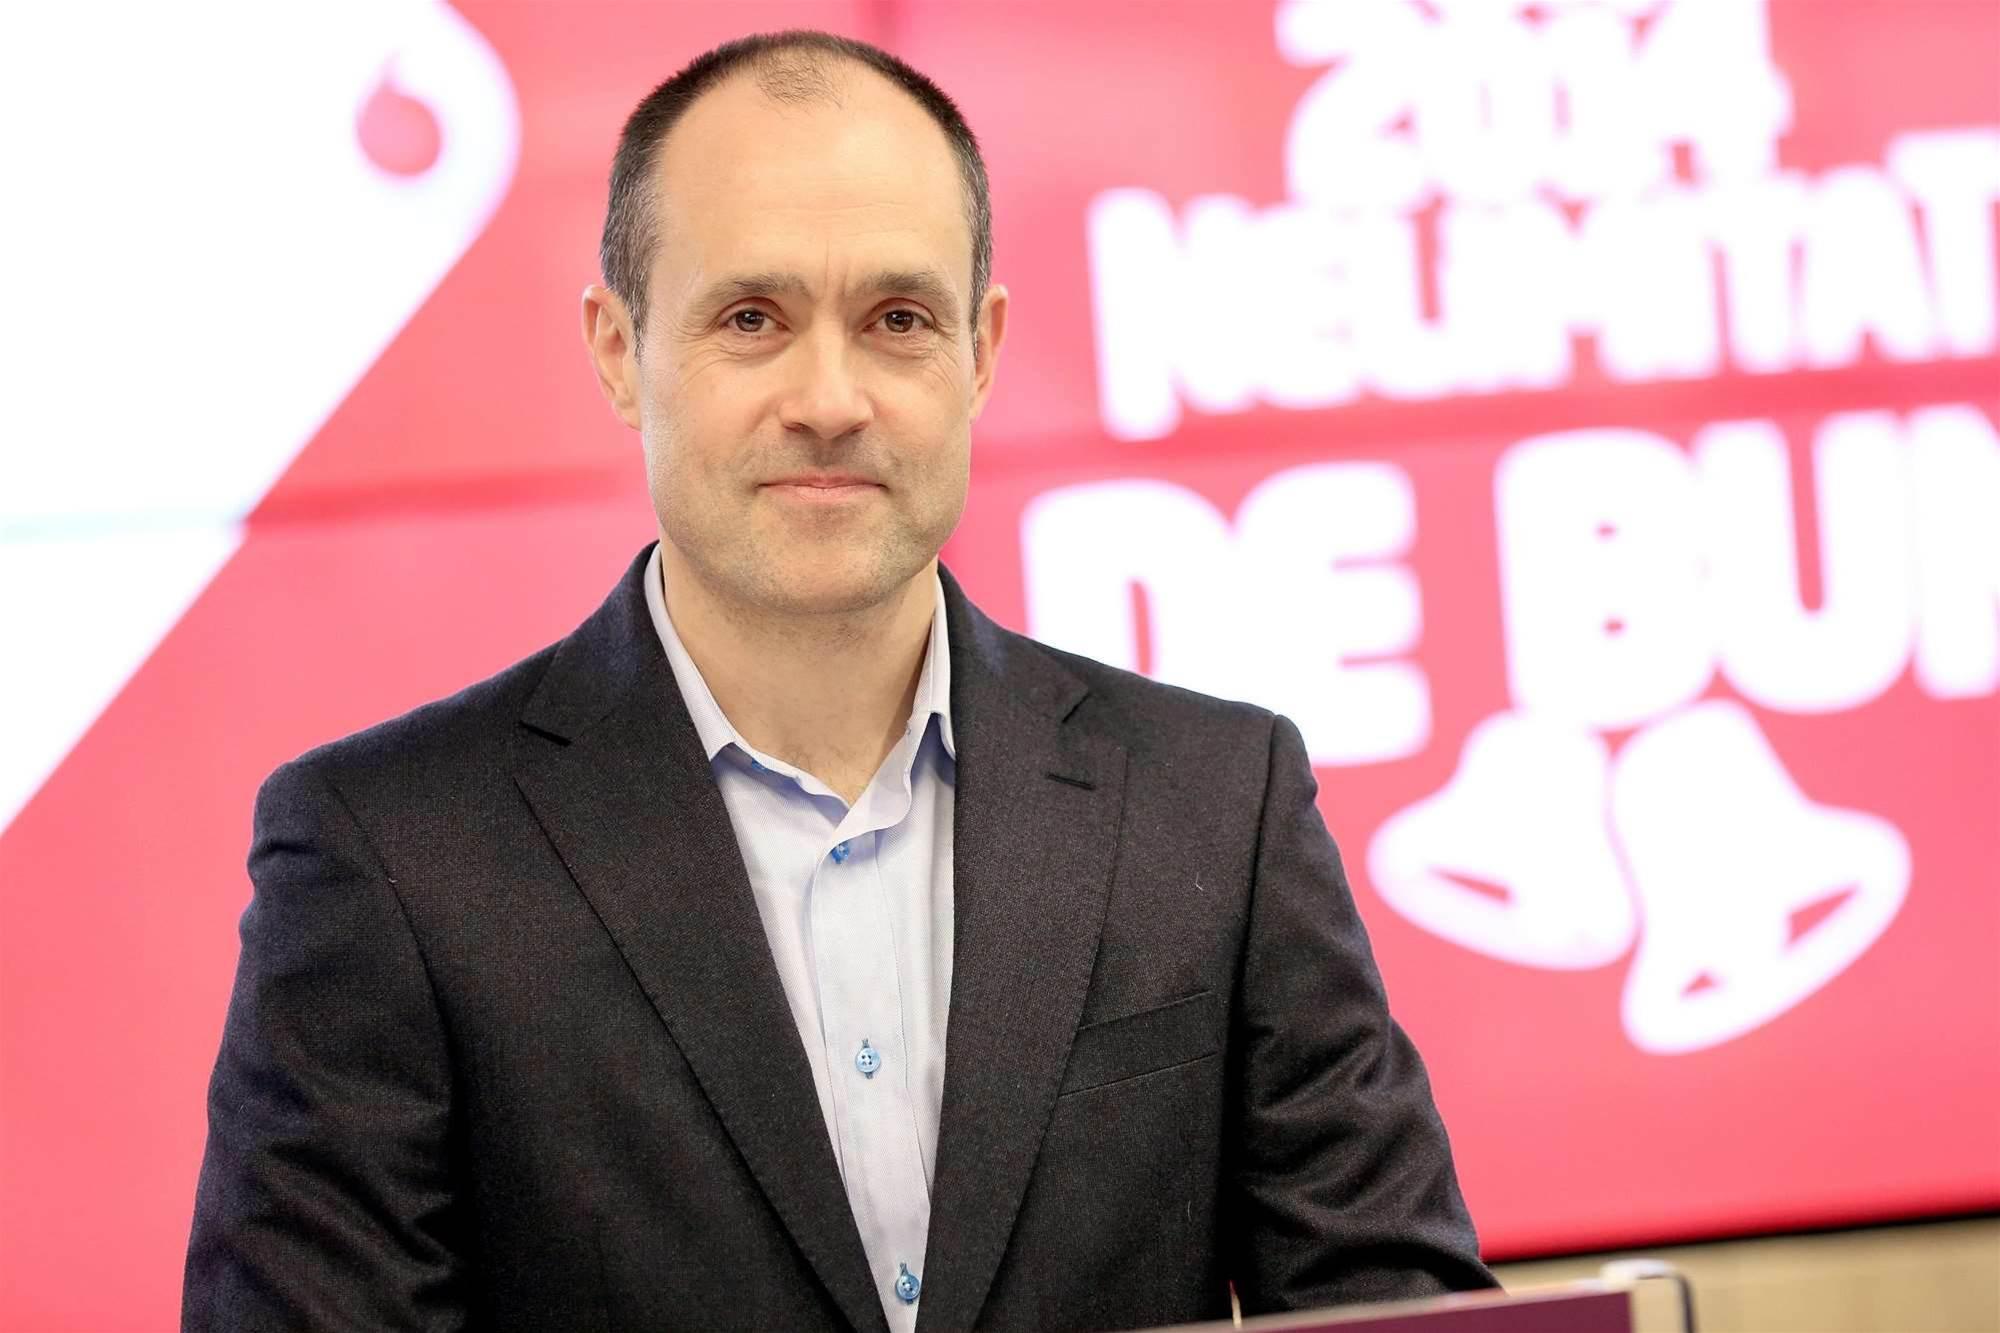 Vodafone CEO admits negative perceptions linger